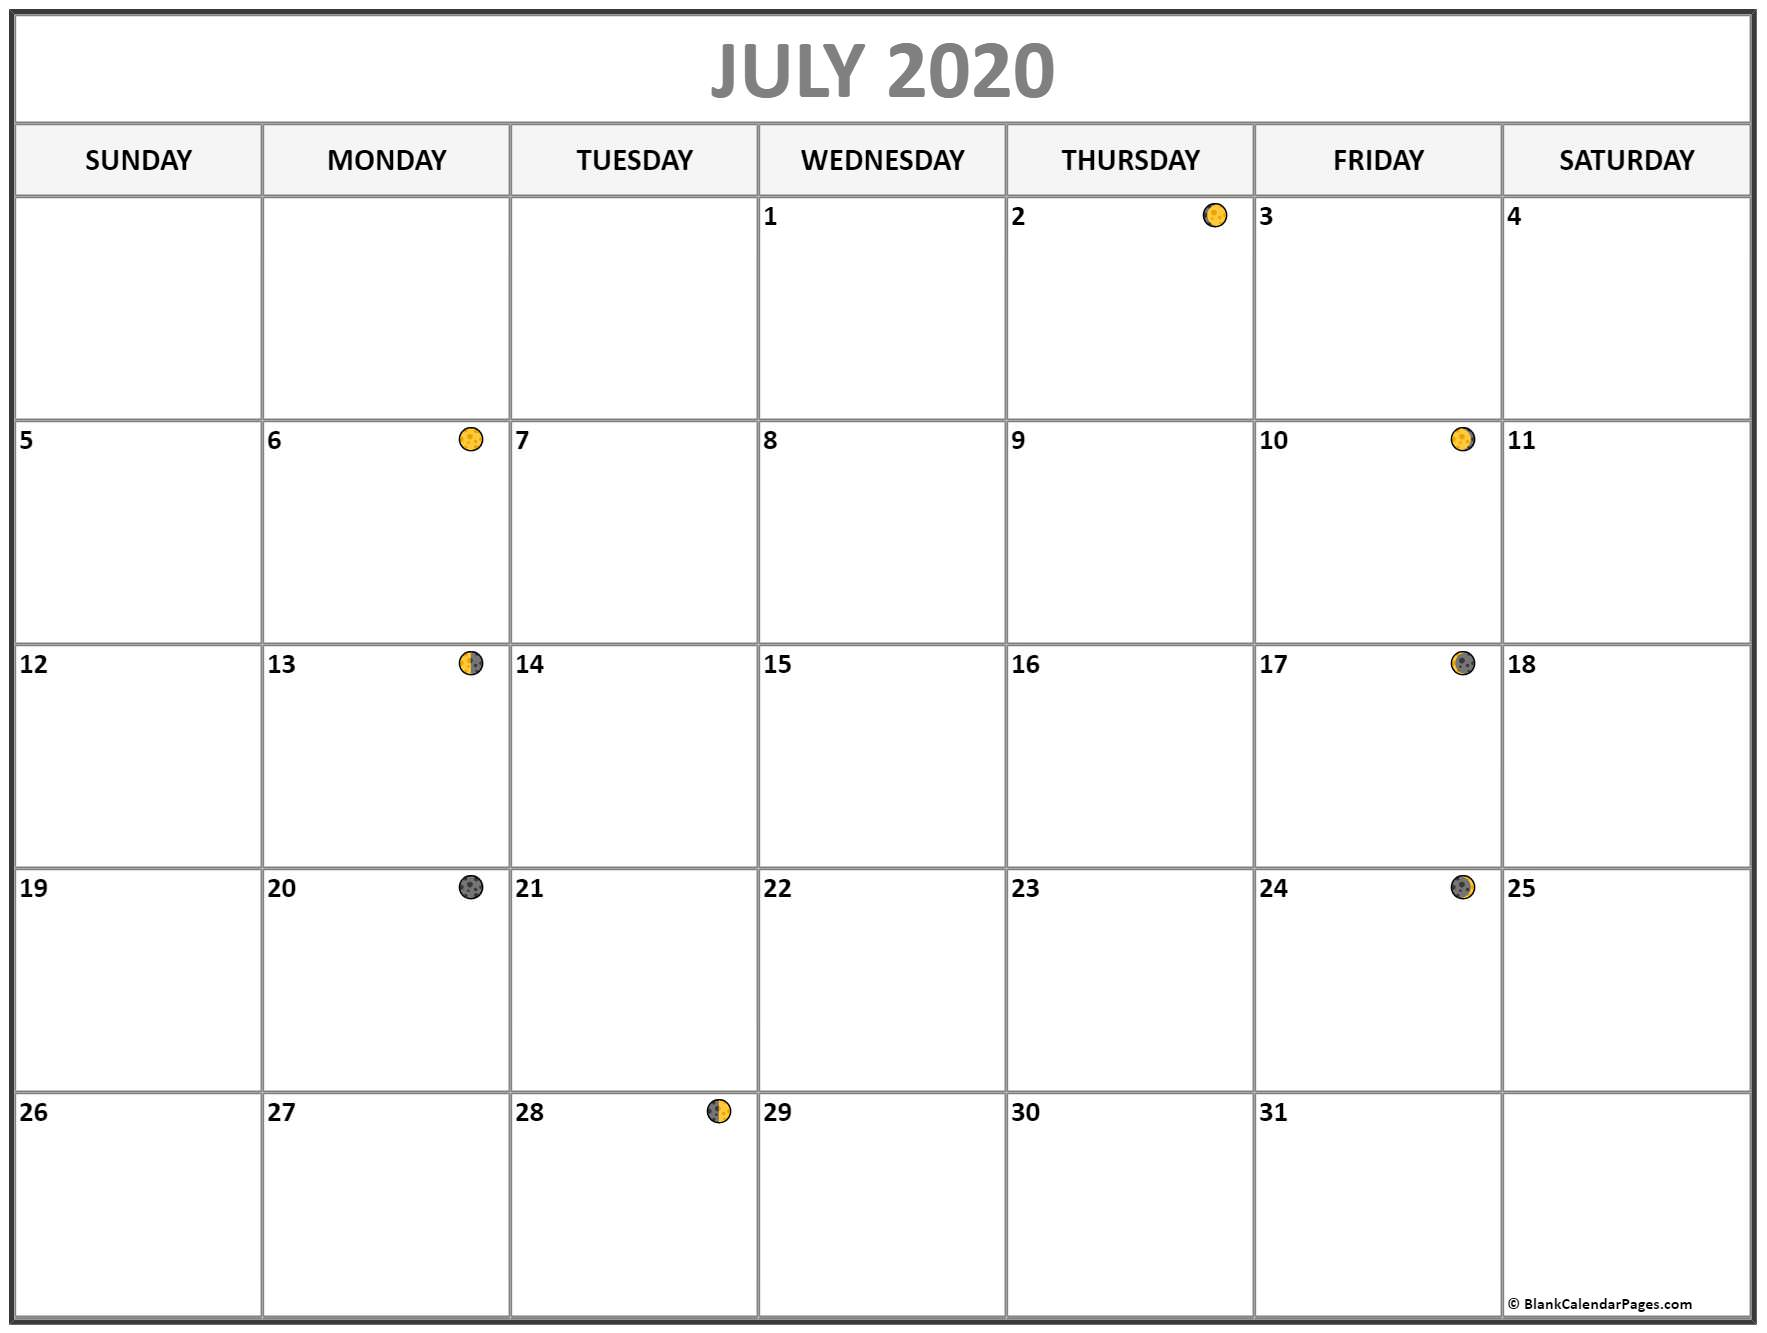 July 2020 Lunar Calendar